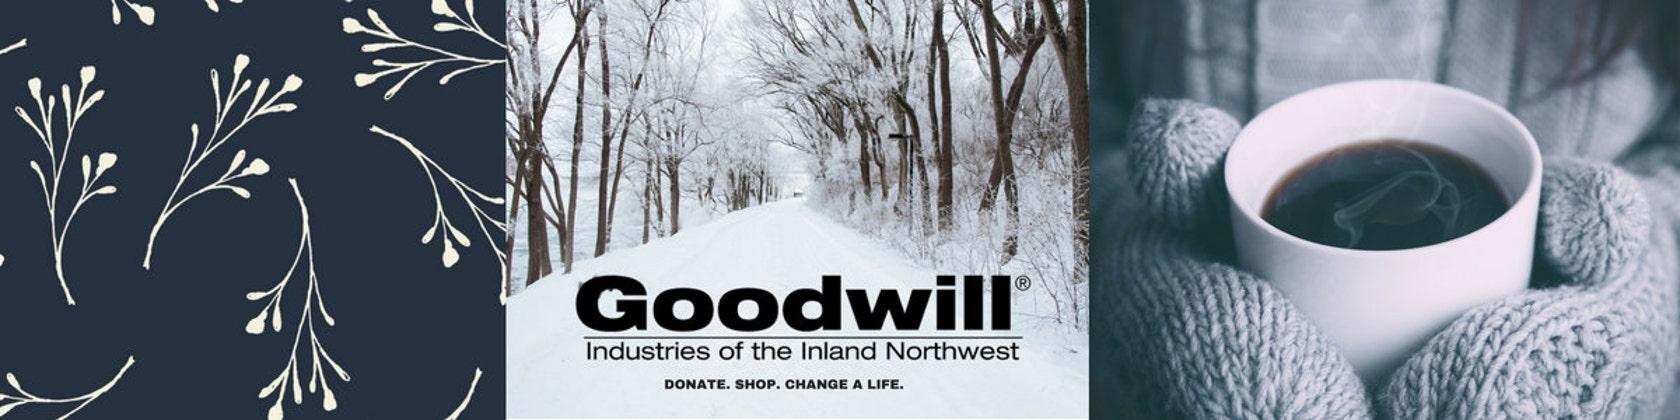 shopgoodwill.com spokane